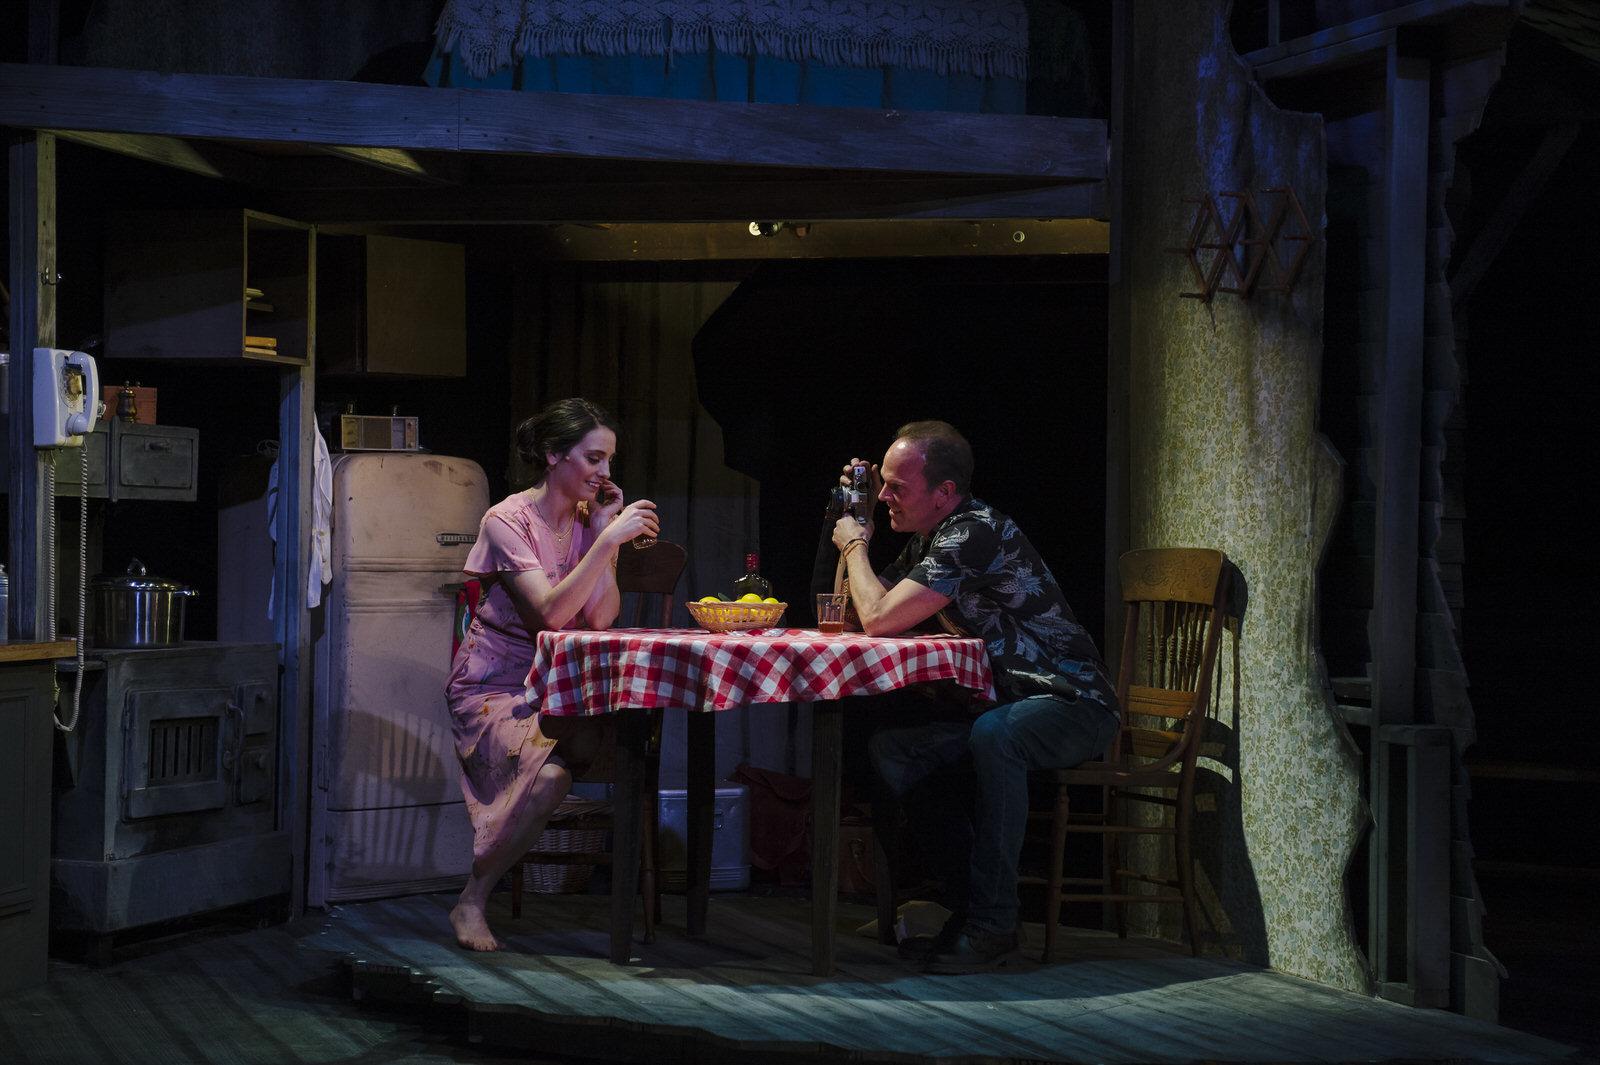 Susan Derry as Francesca and Dan Felton as Robert in Bridges of Madison County at Keegan Theatre